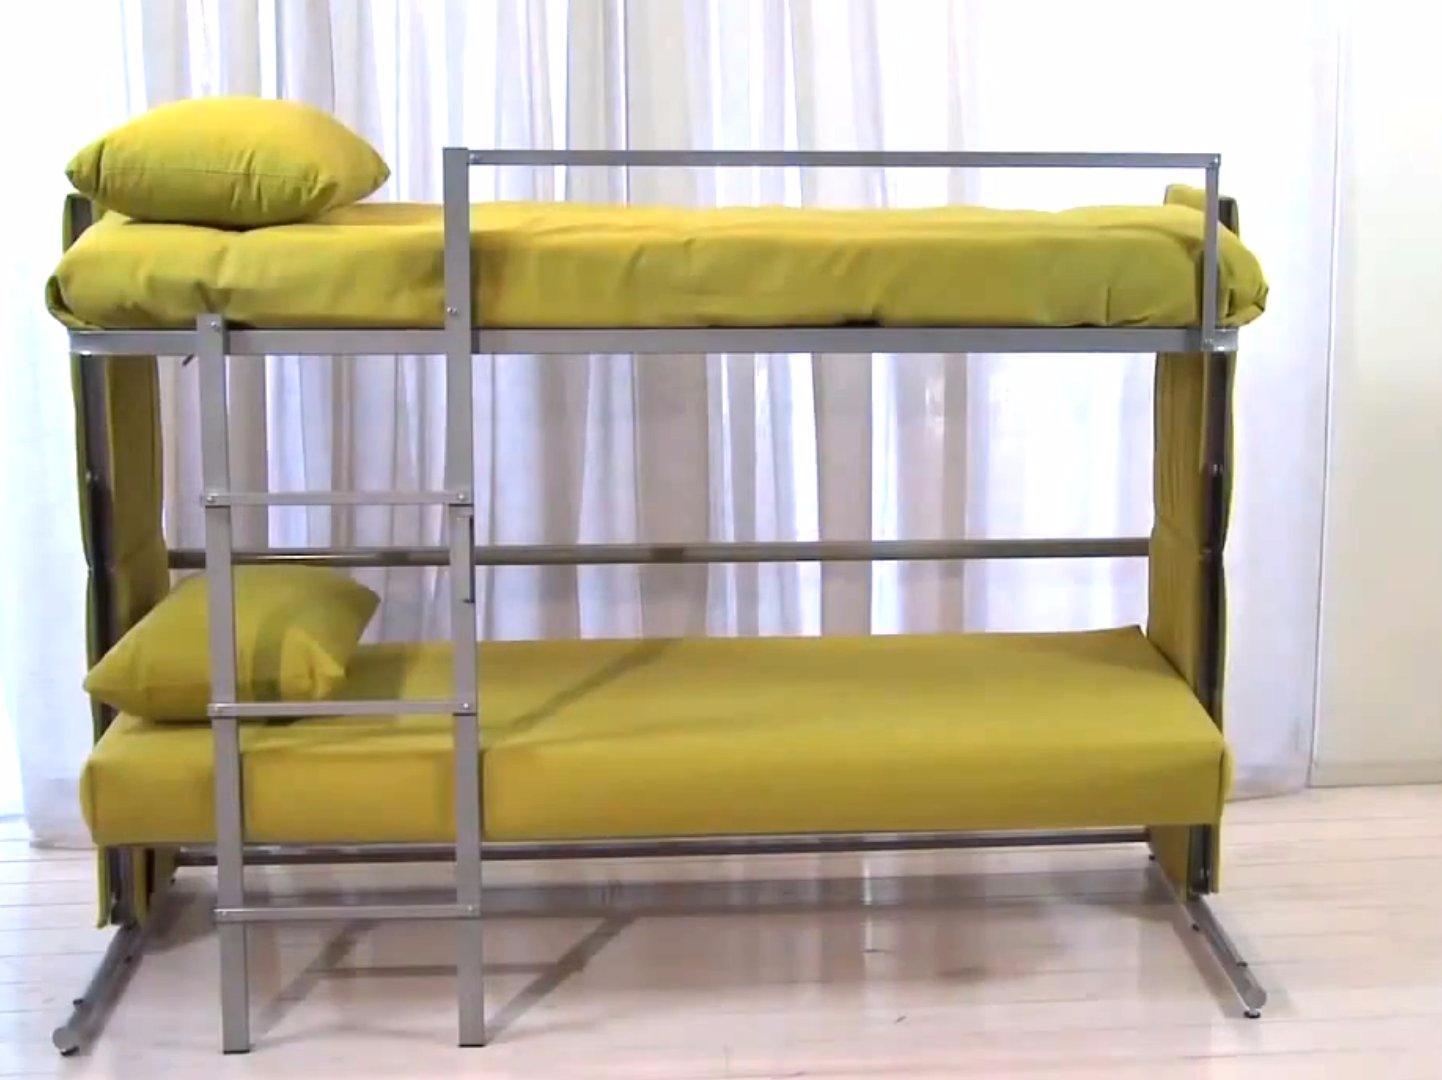 20 Ideas Of Sofa Bunk Beds Sofa Ideas